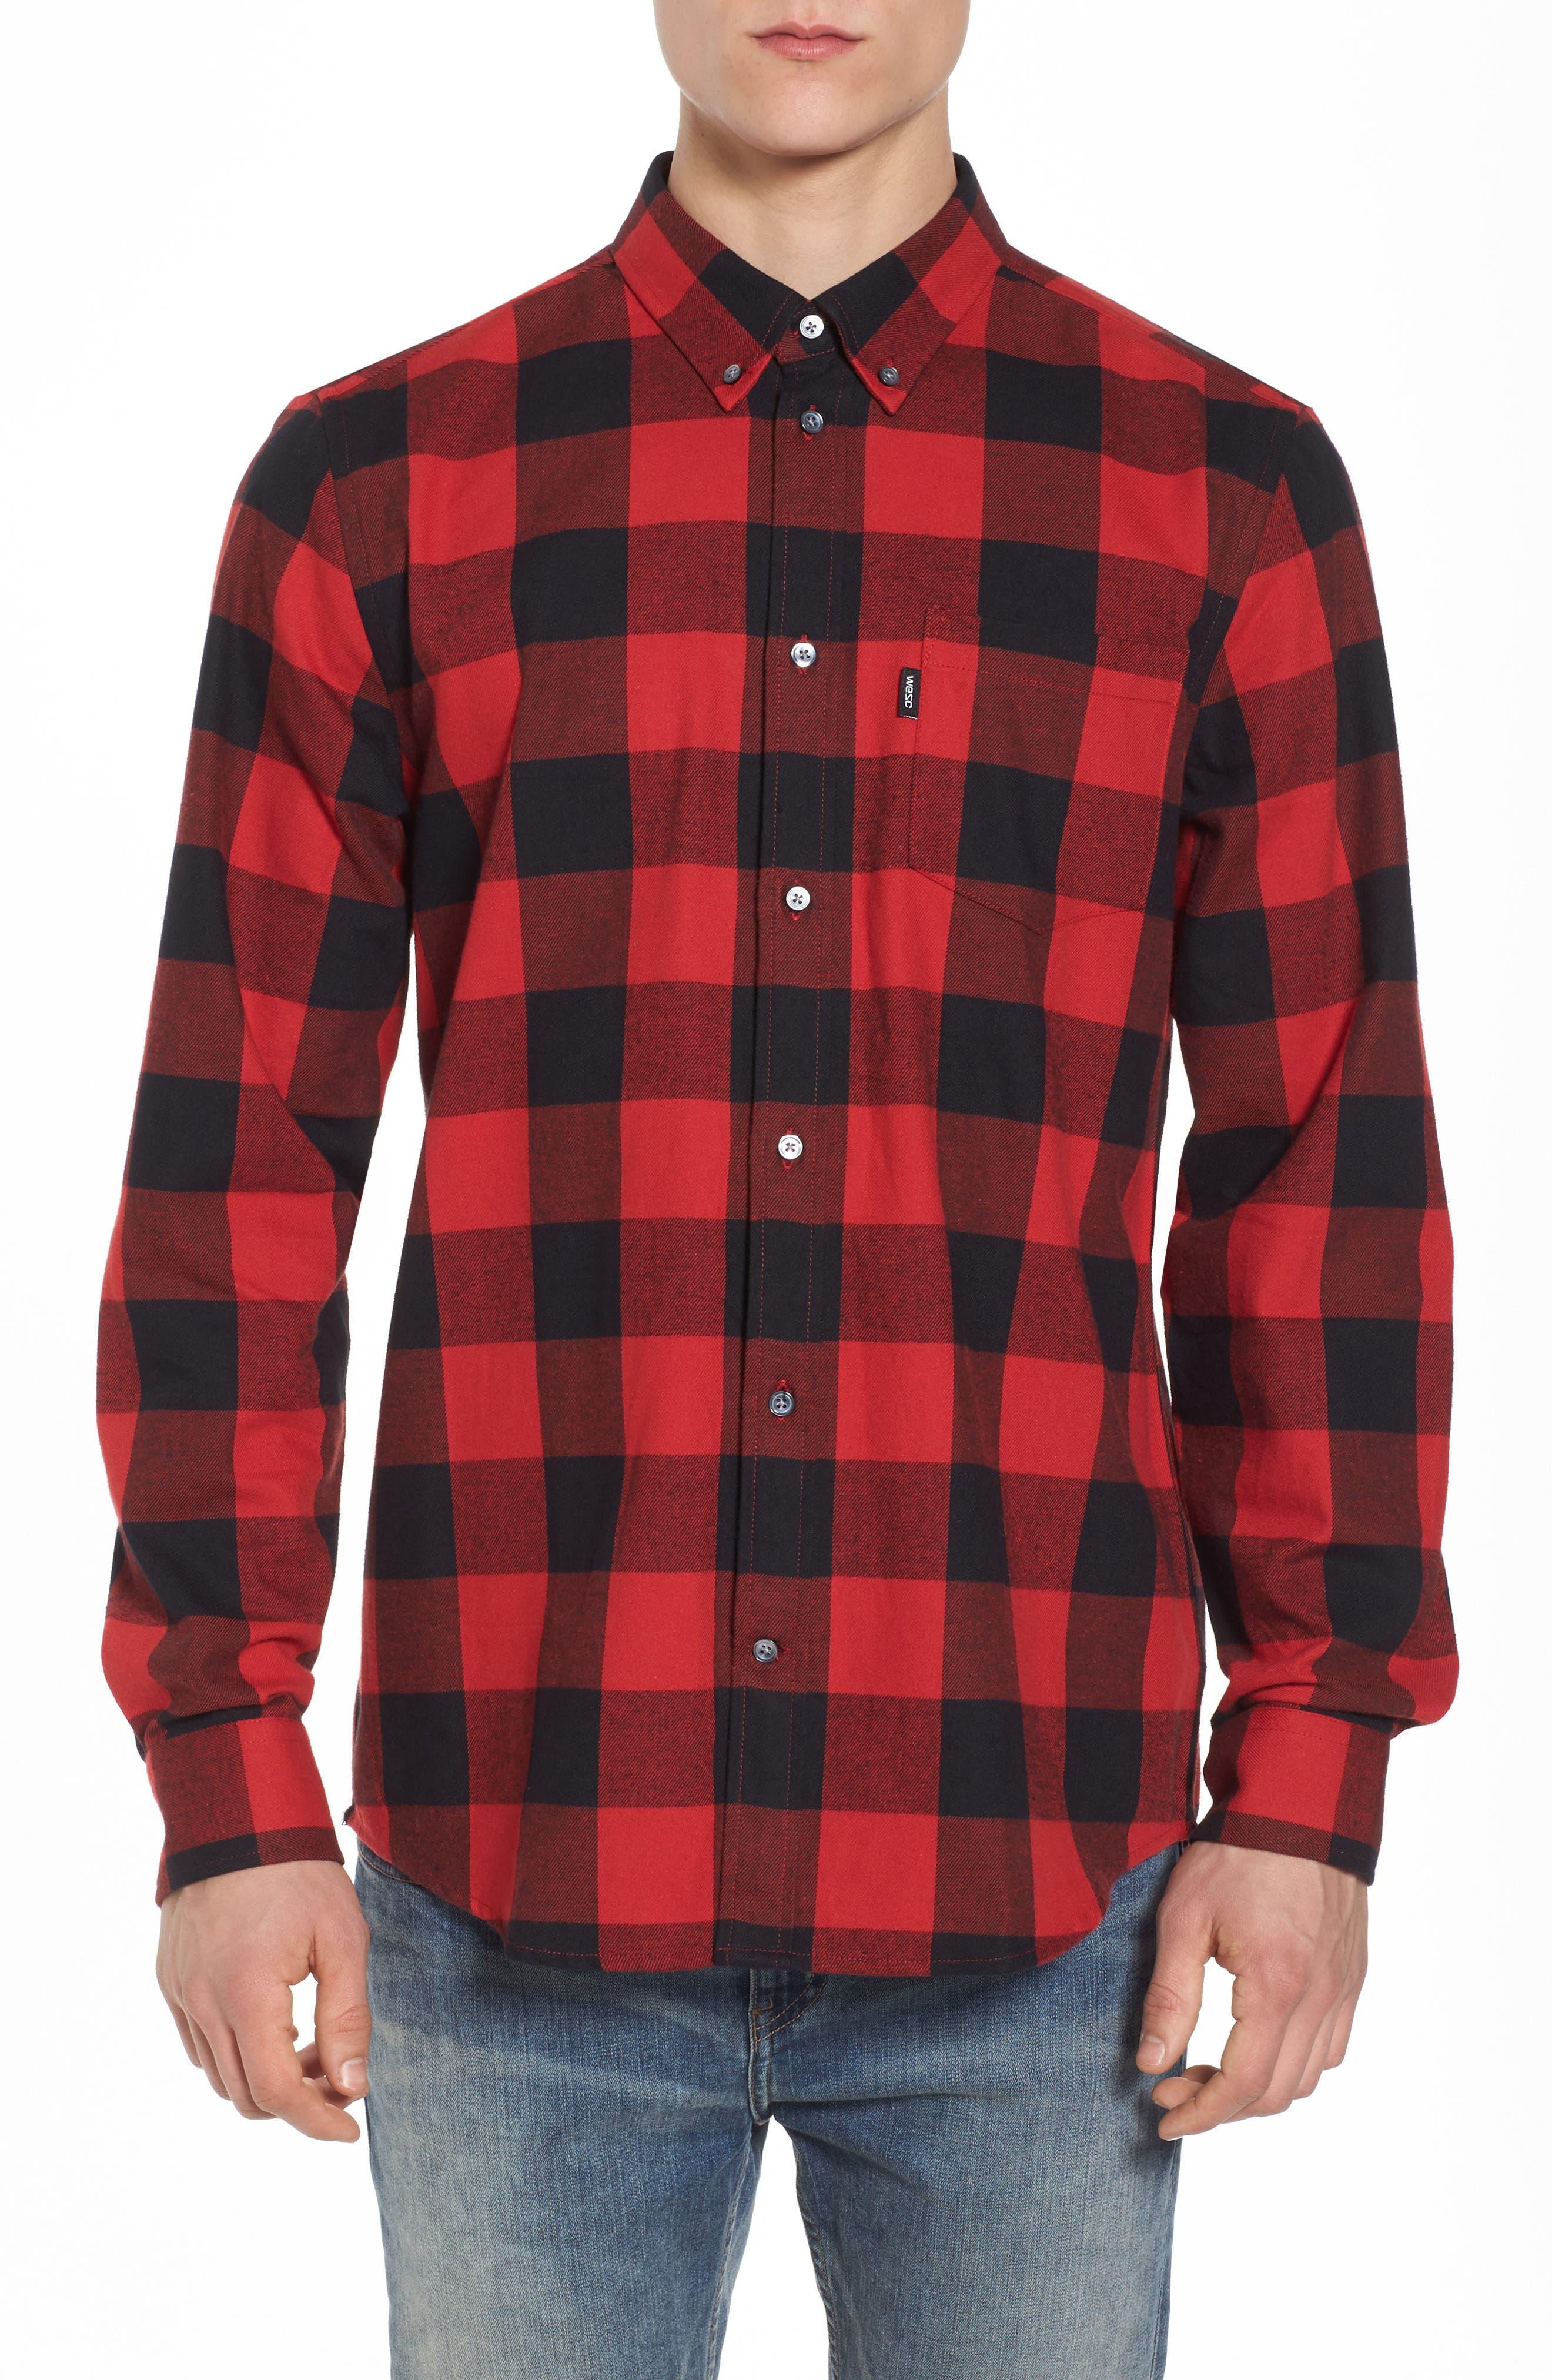 WeSC Olavi Check Flannel Shirt